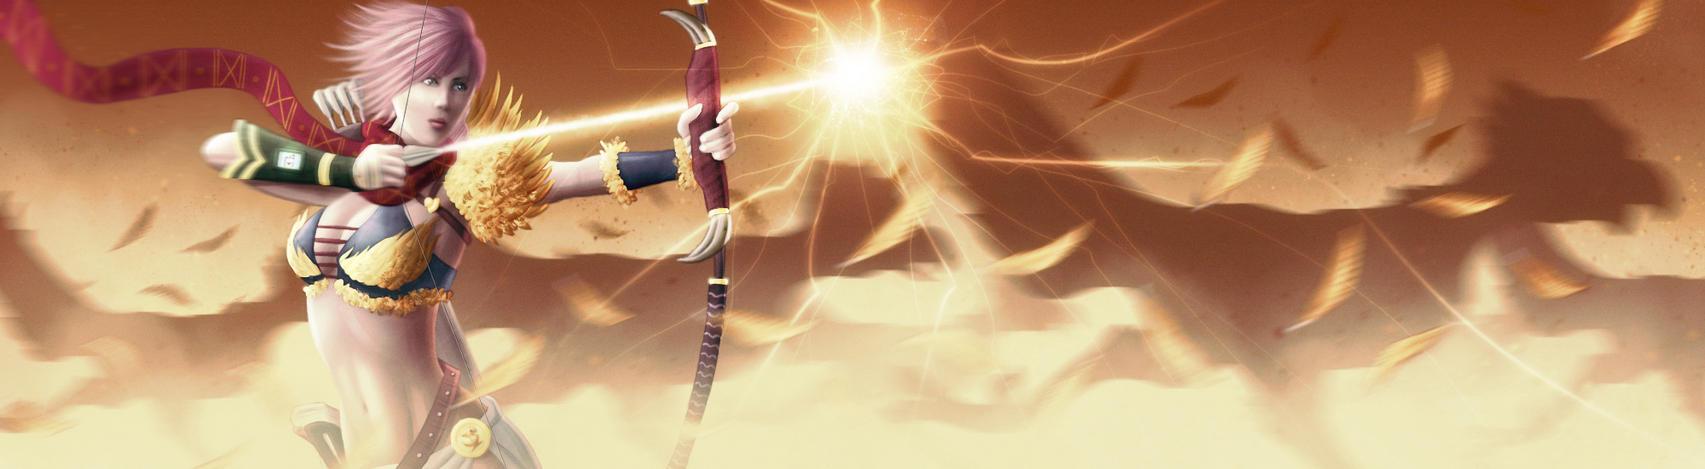 Lightning Returns: FFXIII - Chocobo Princess by JussiKarro